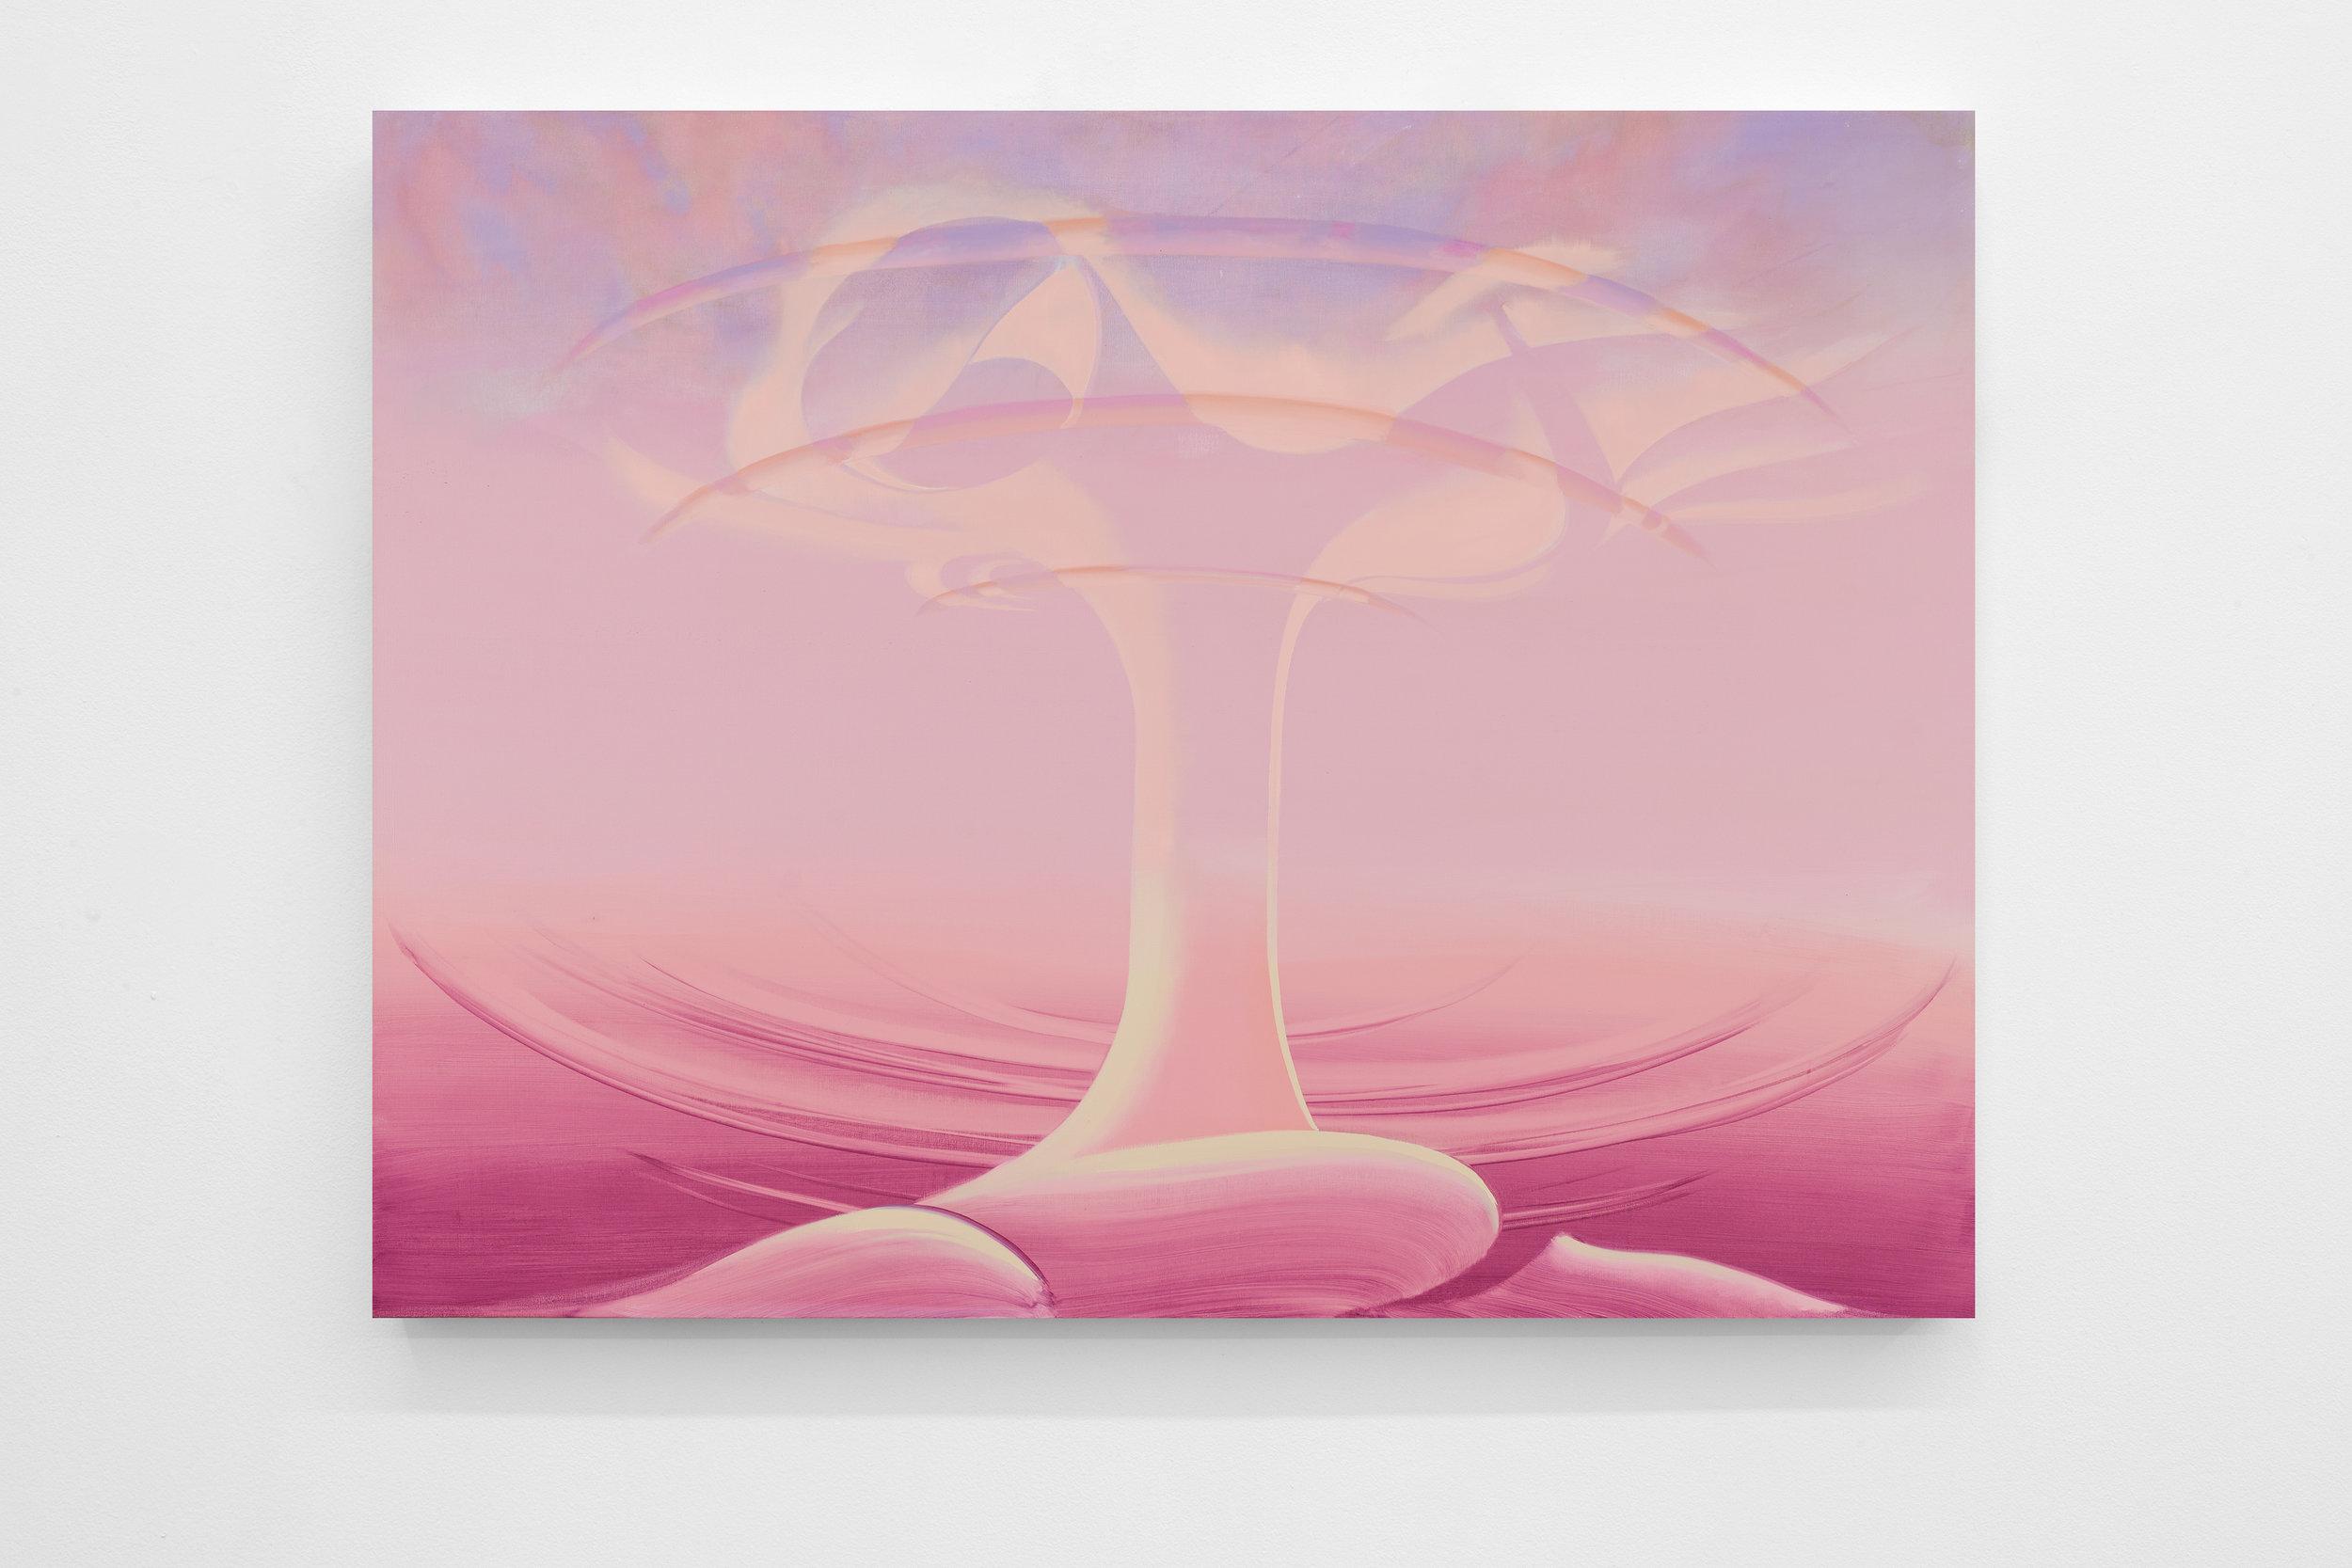 Anders Oinonen,  Sulo , 2019, Oil on canvas, 75 x 96 in